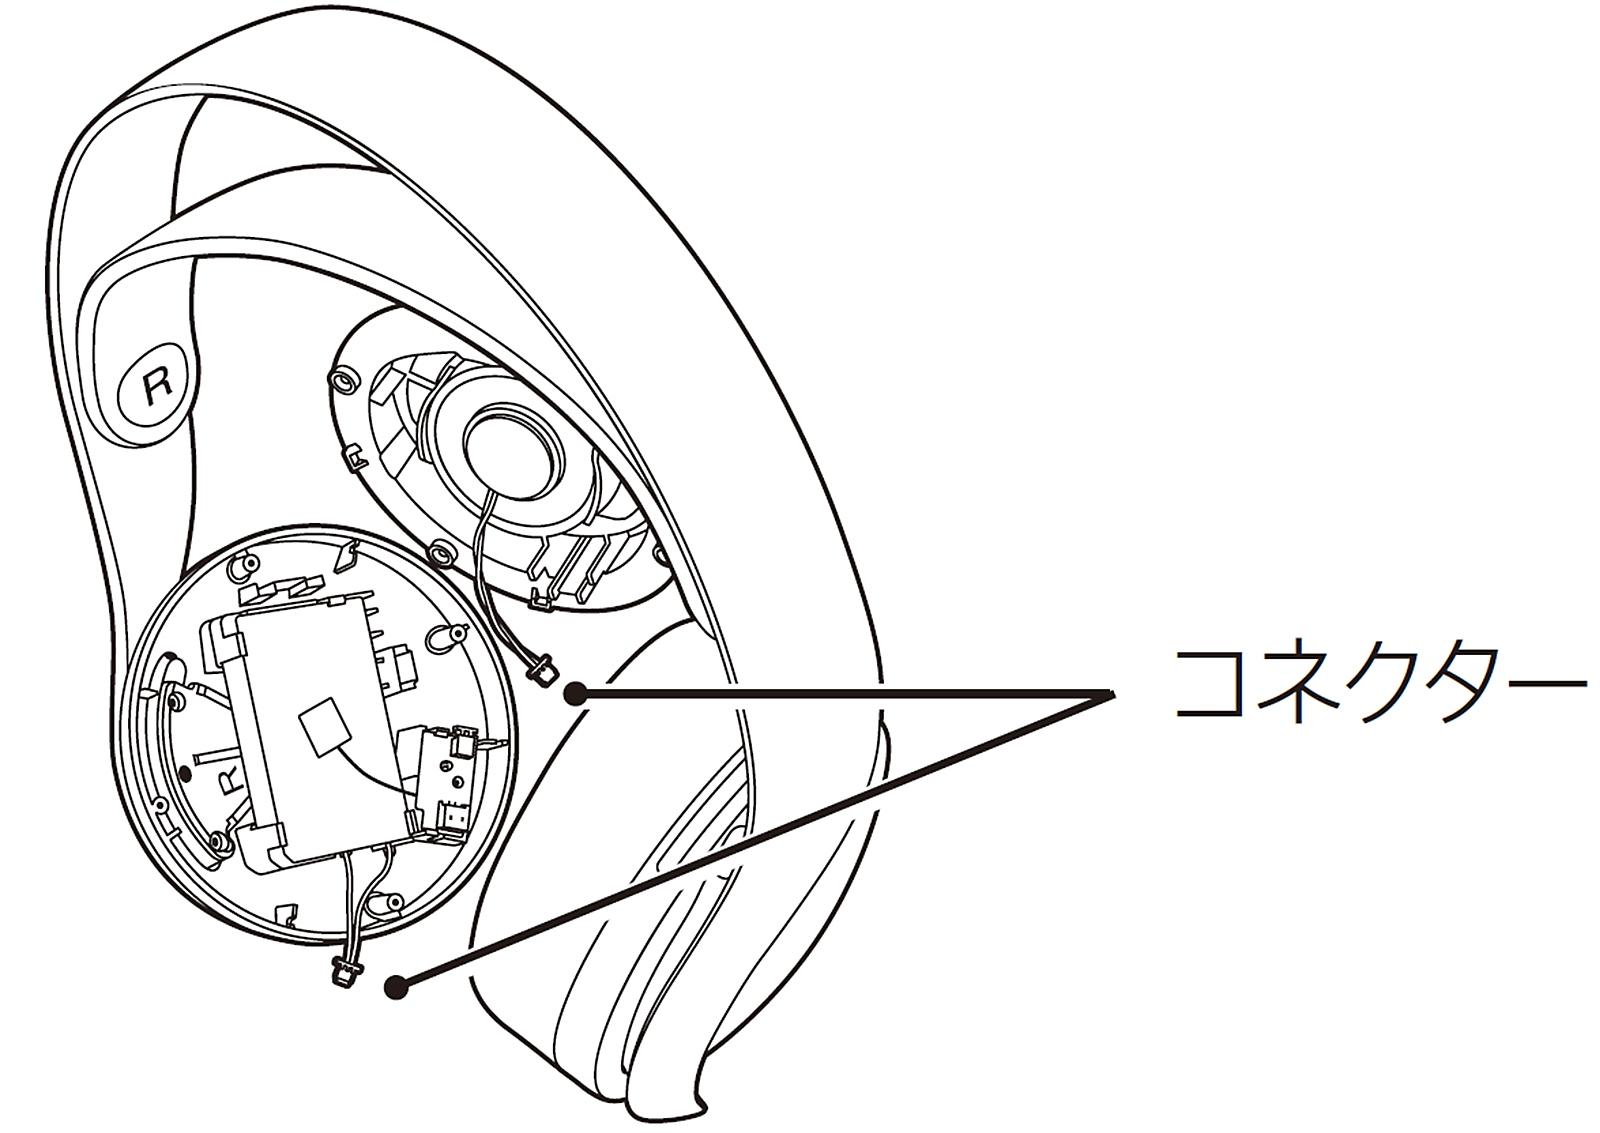 CFI-ZWH1J-image-block-remove-battery-03-ja-jp-28apr21.png